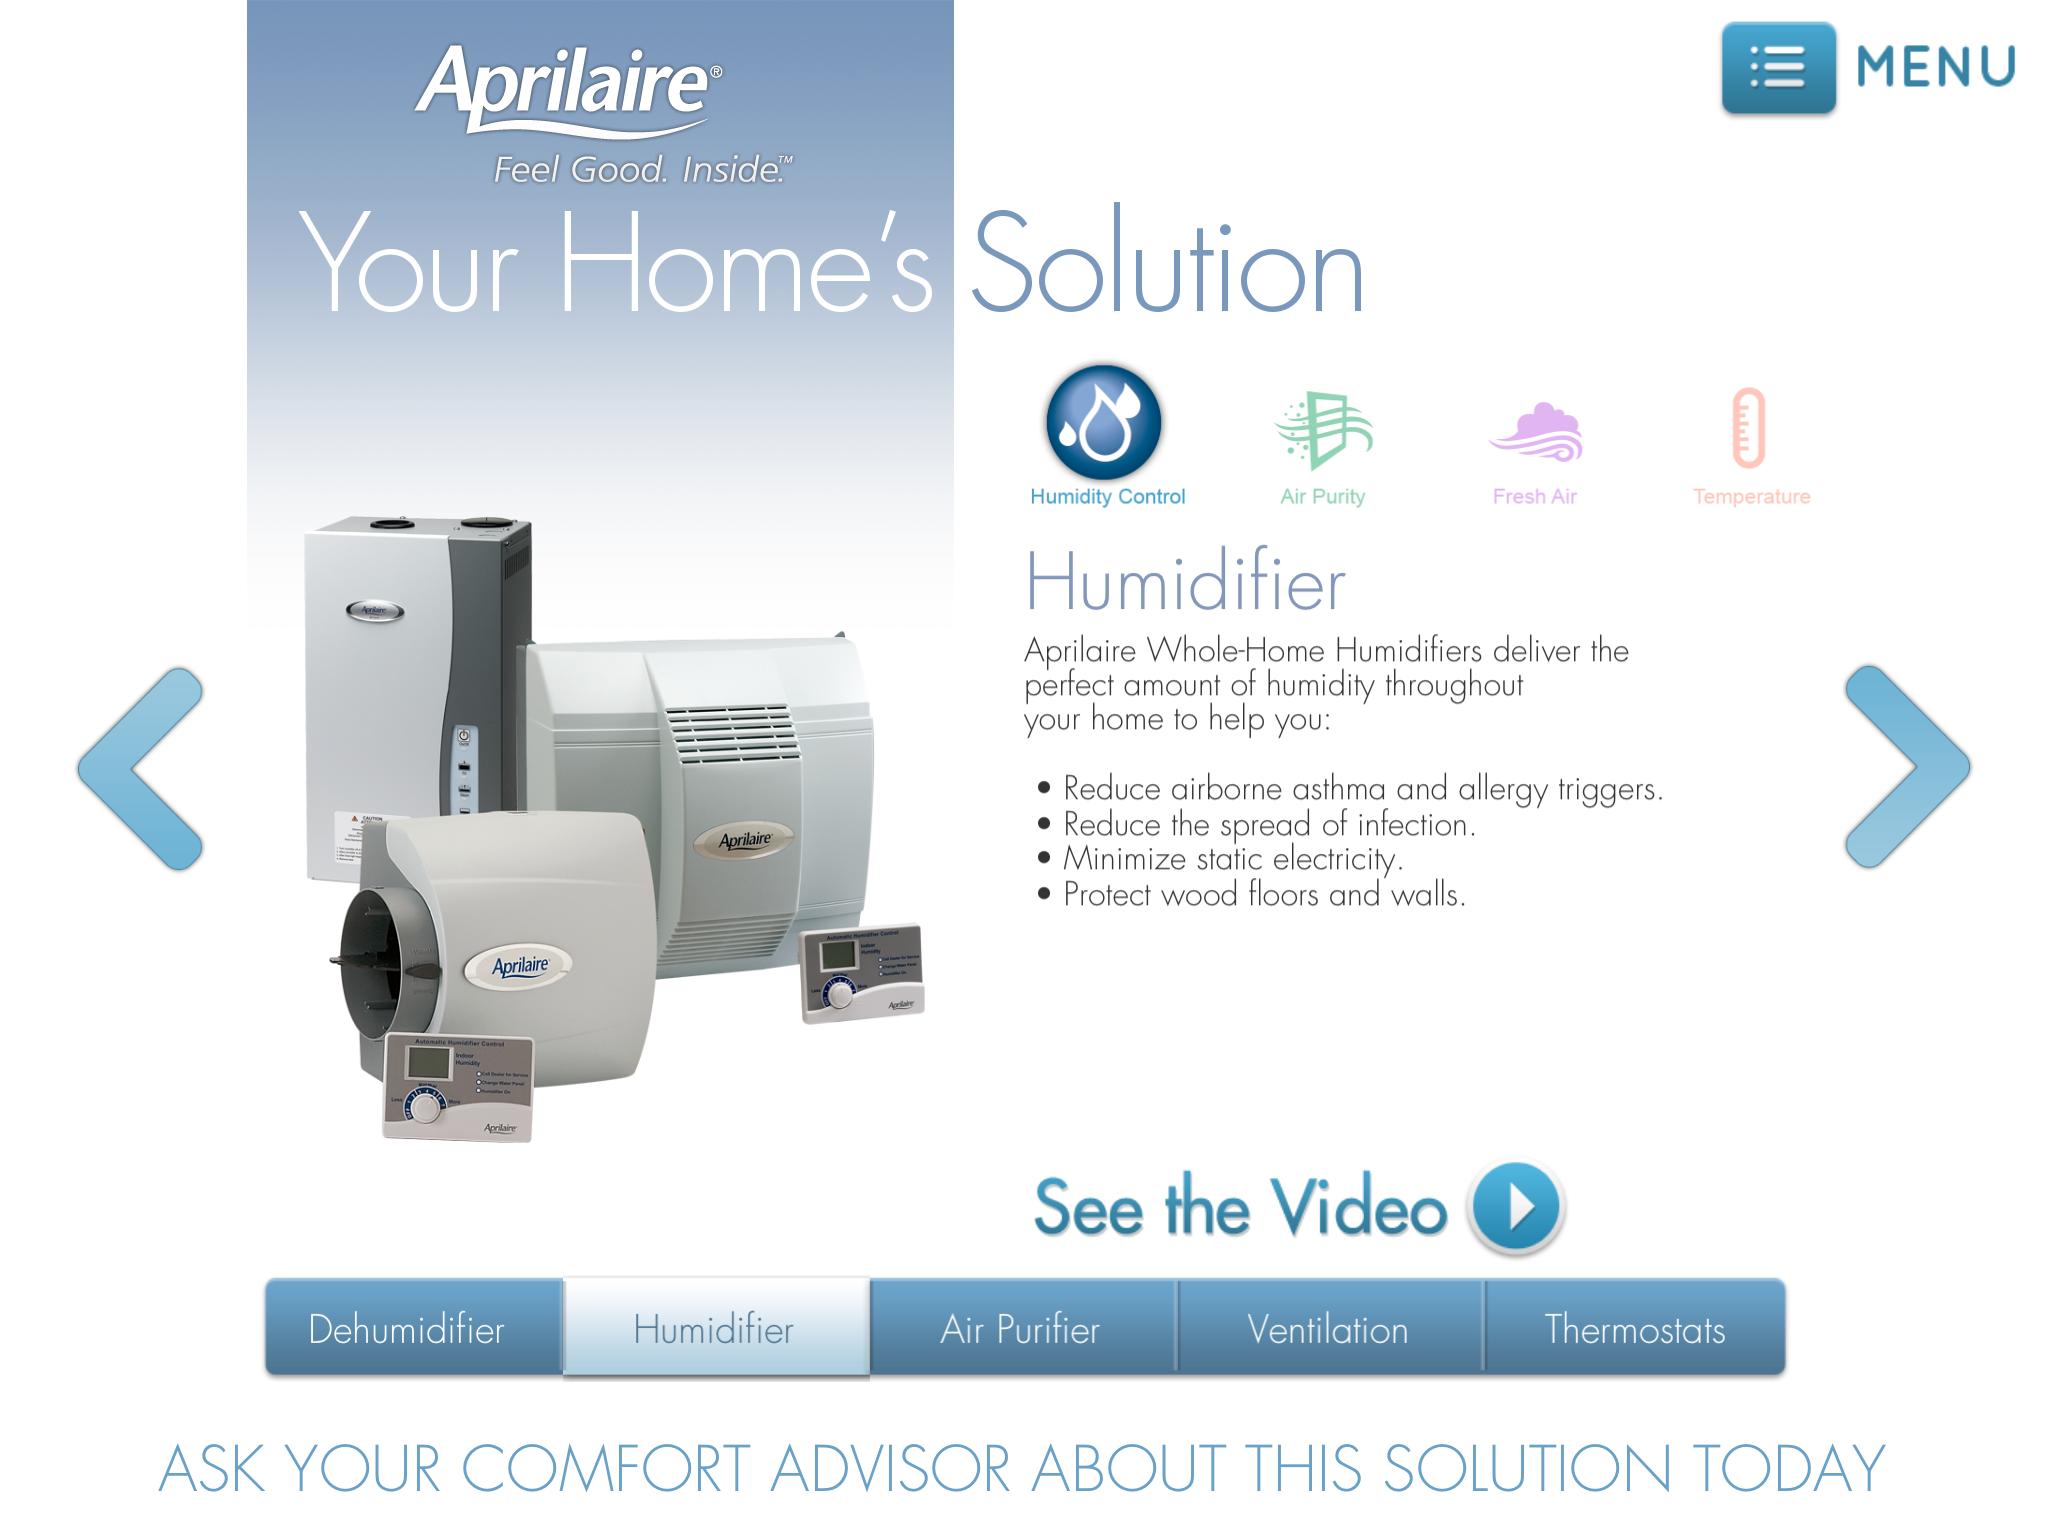 Aprilaire Comfort Advisor-Humidifier